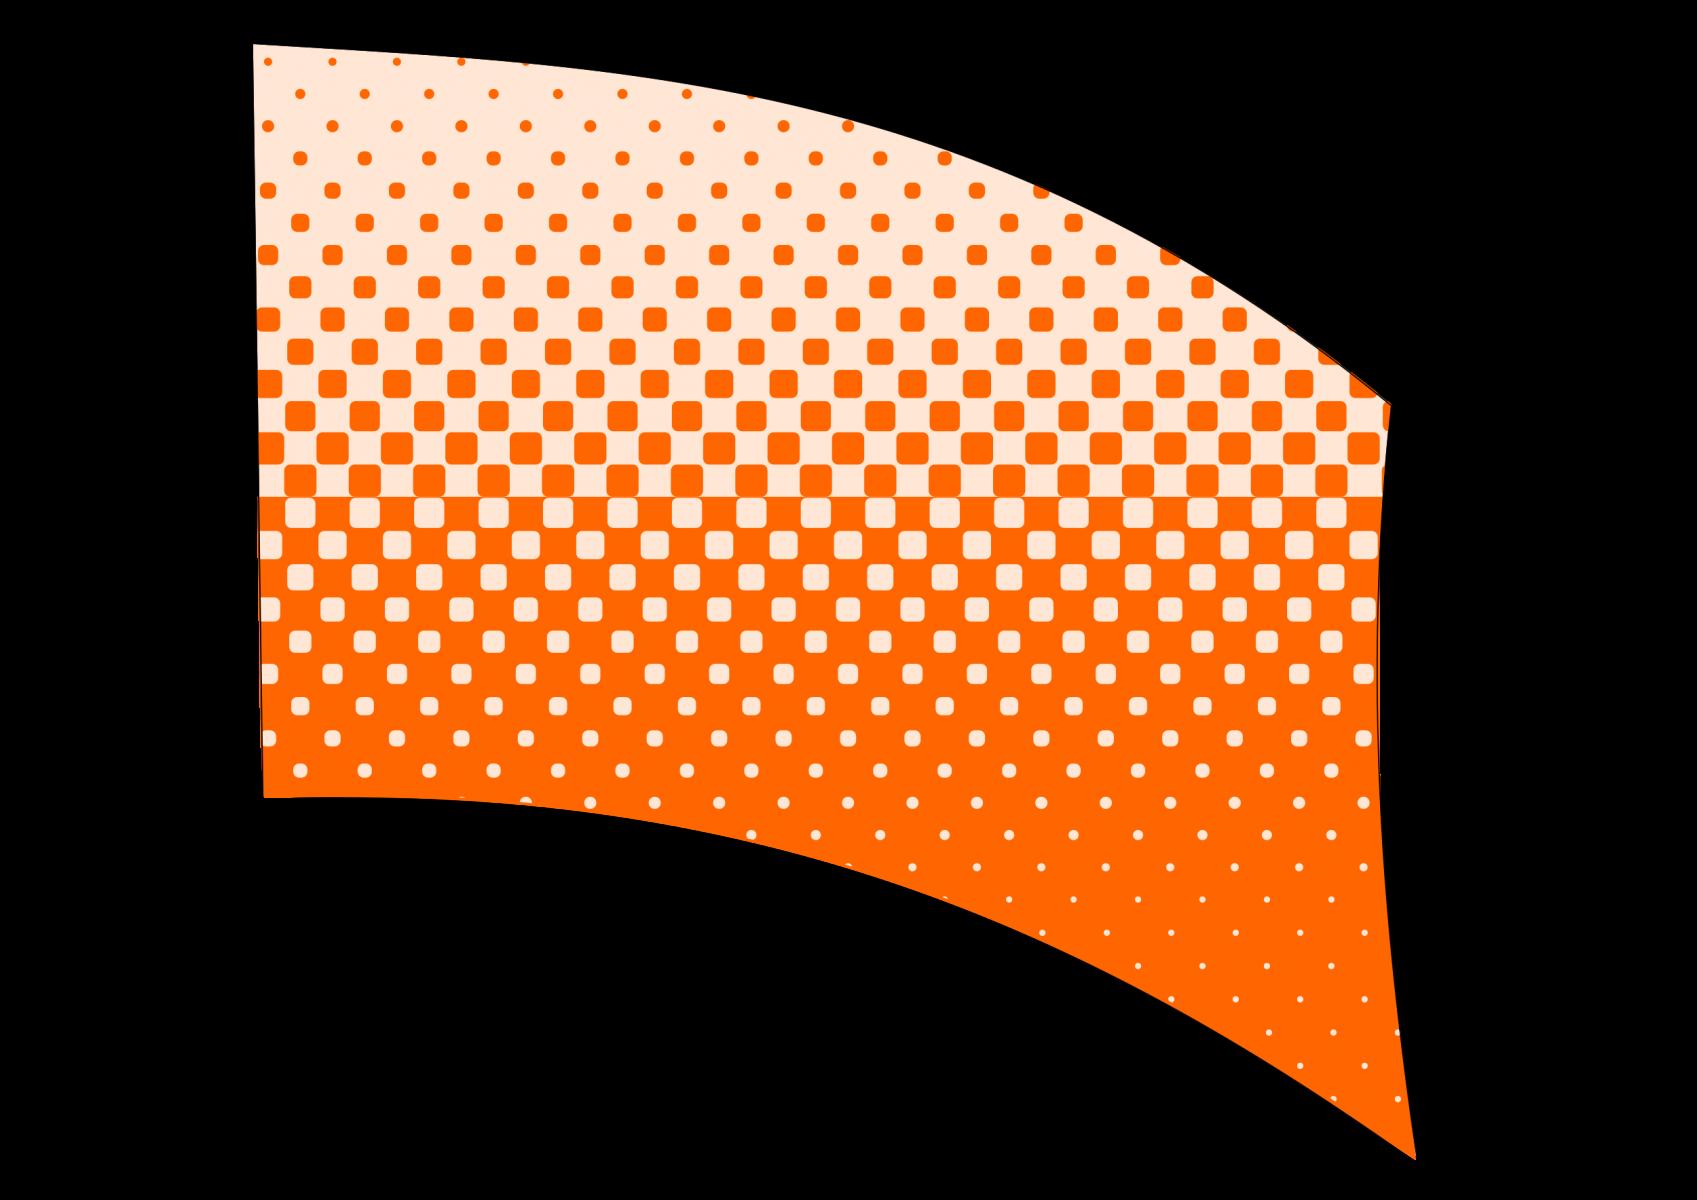 010503s - 36x54 Standard Orange Halftone Blend